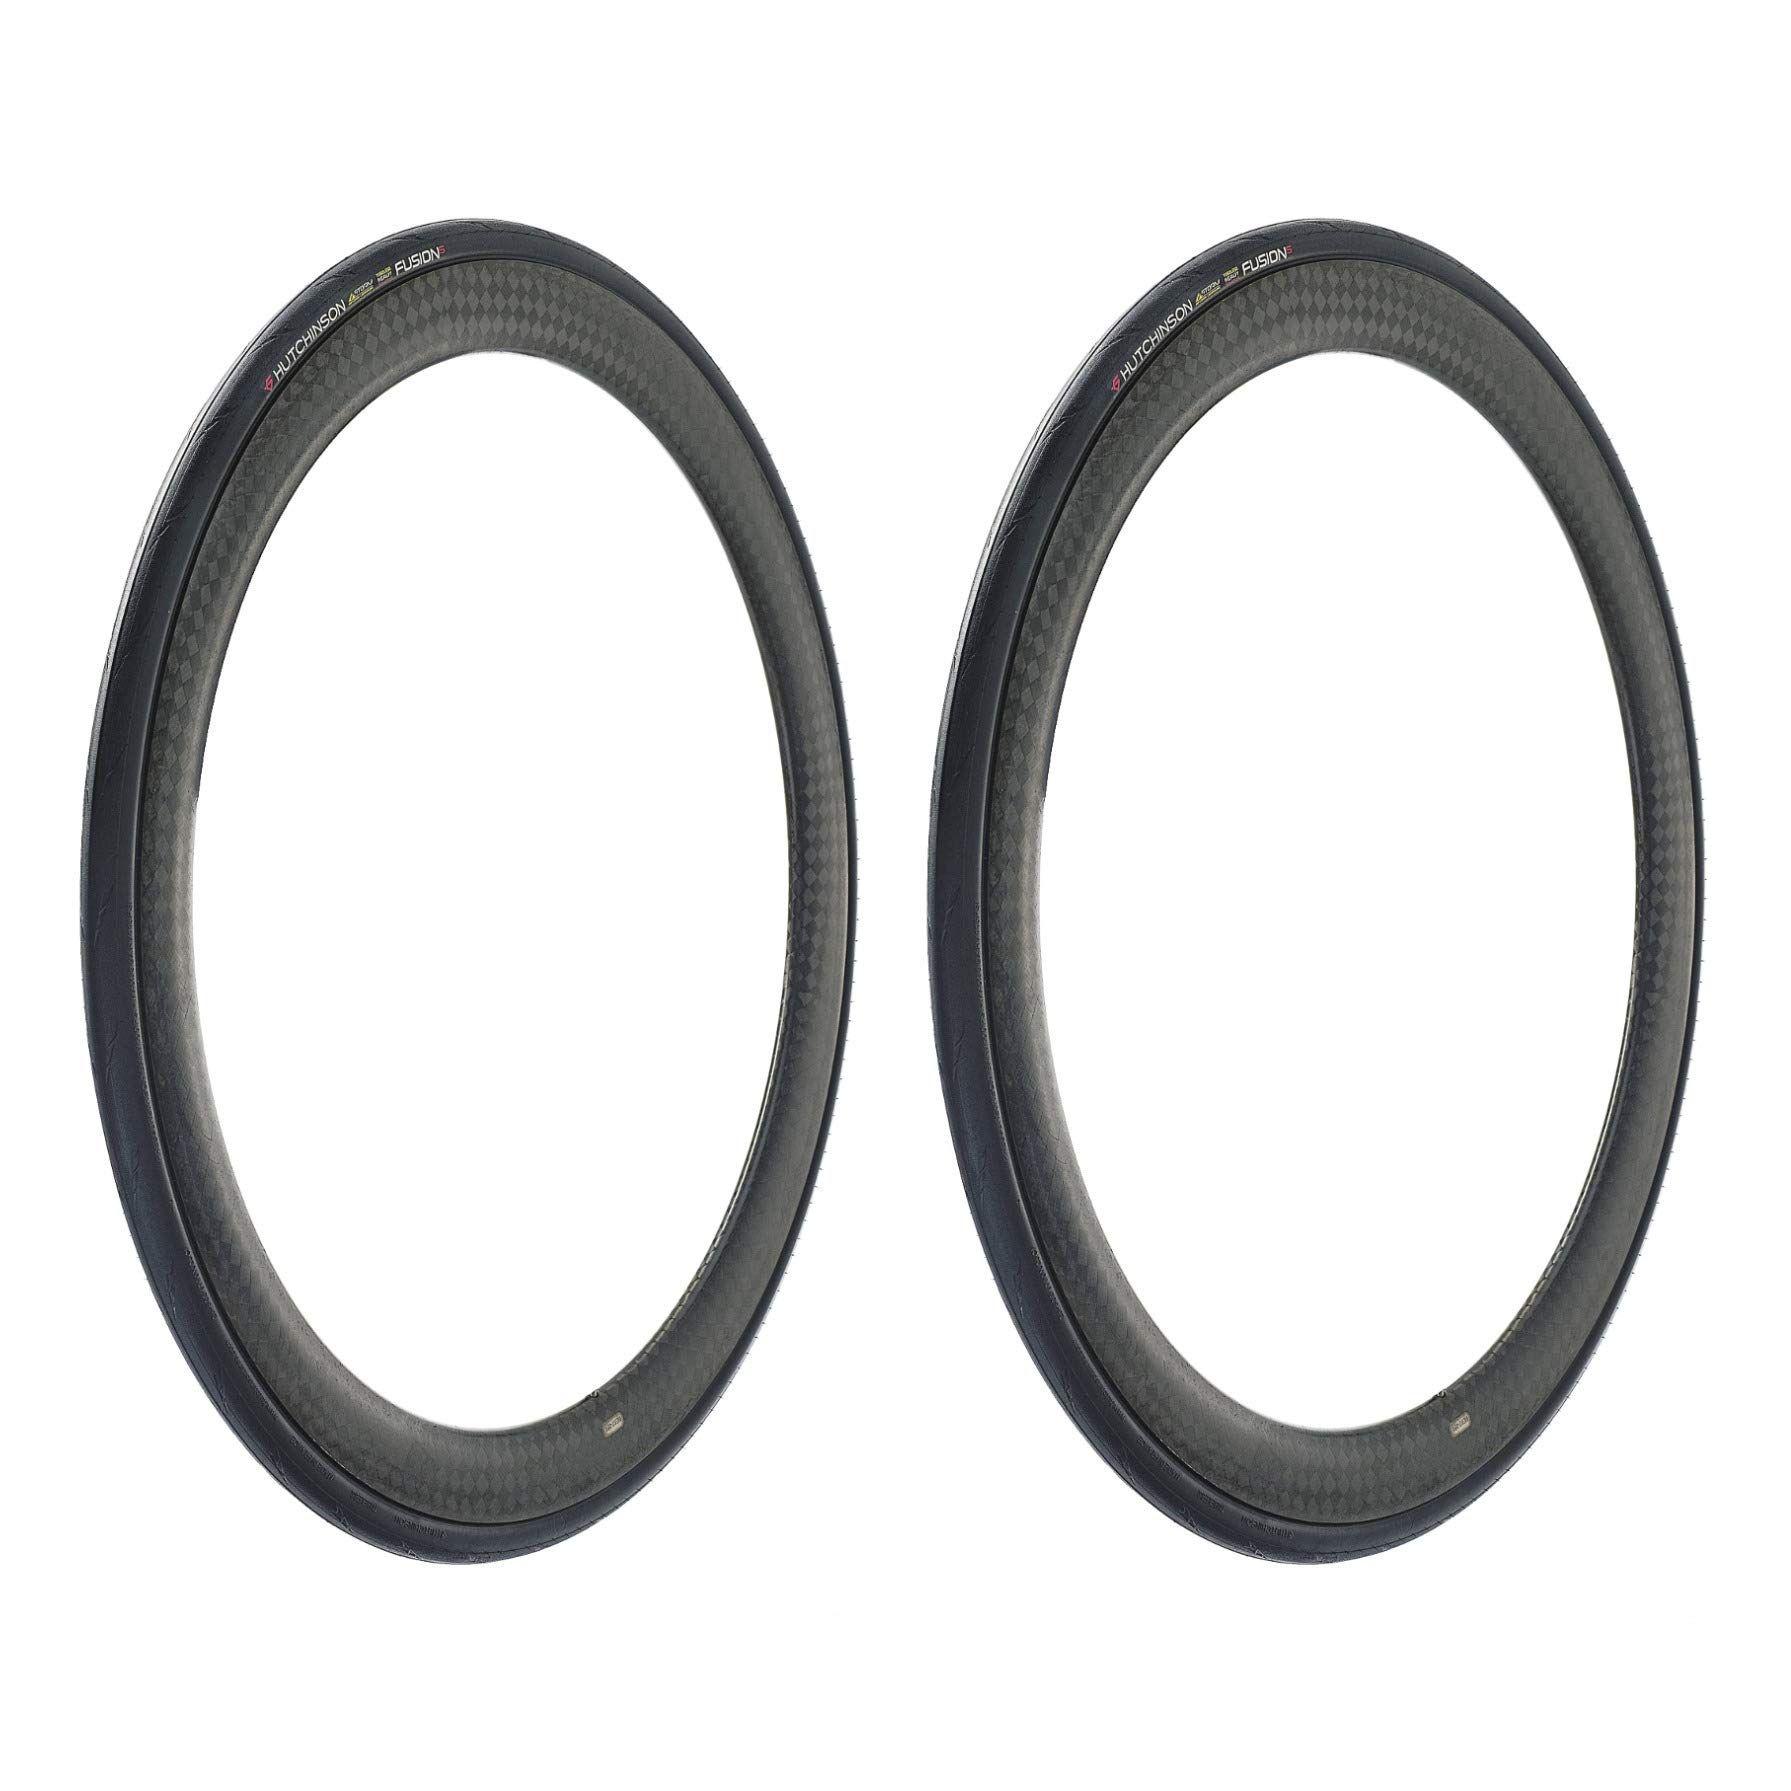 Black 2-Pack Hutchinson FUSION 5 All-Season Tubeless Ready Bike Tires 700x25